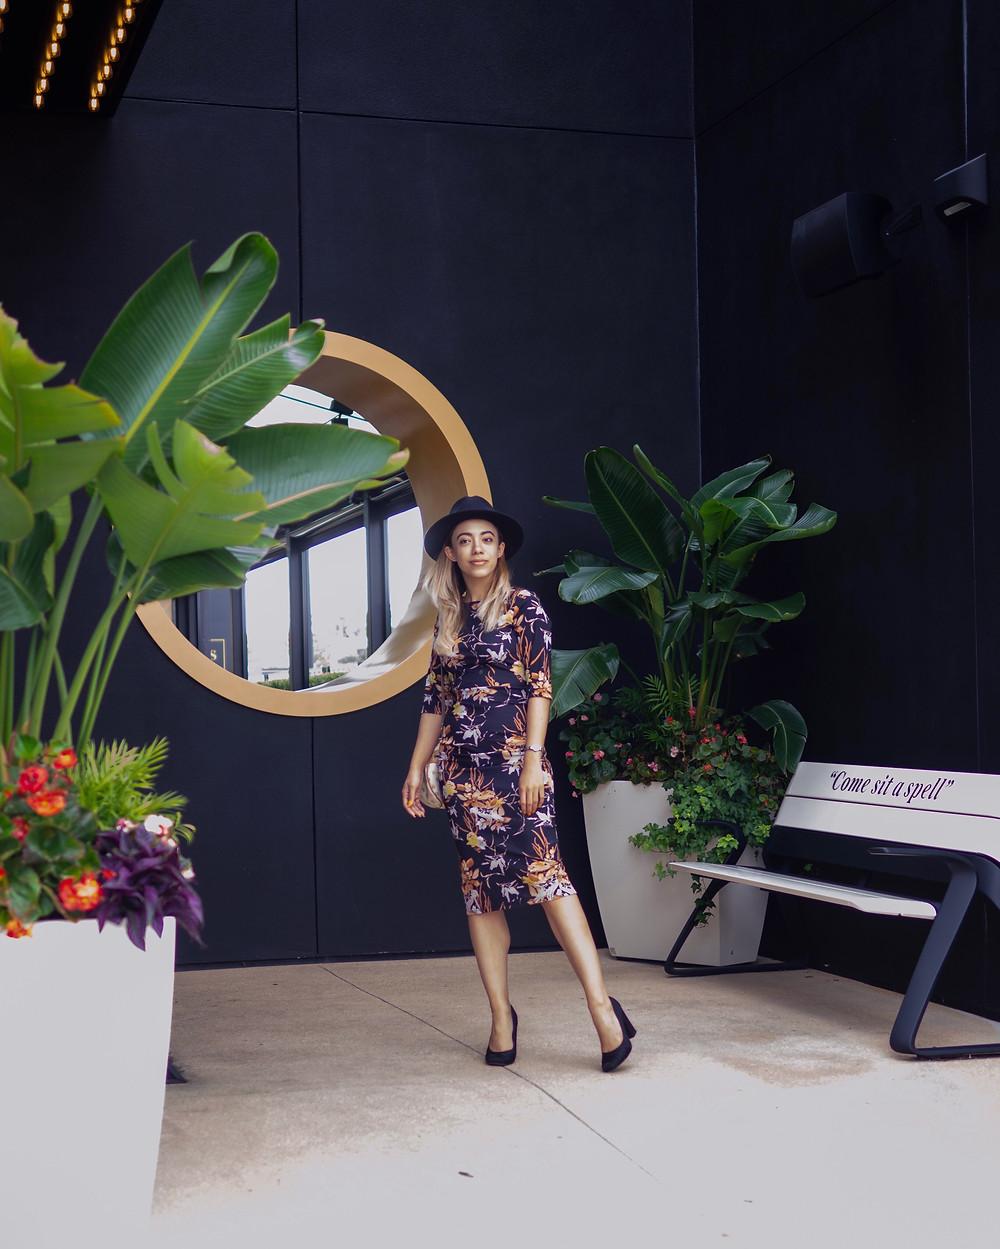 Katrina-Belle-Beauty-Orlando-Fashion-Blogger